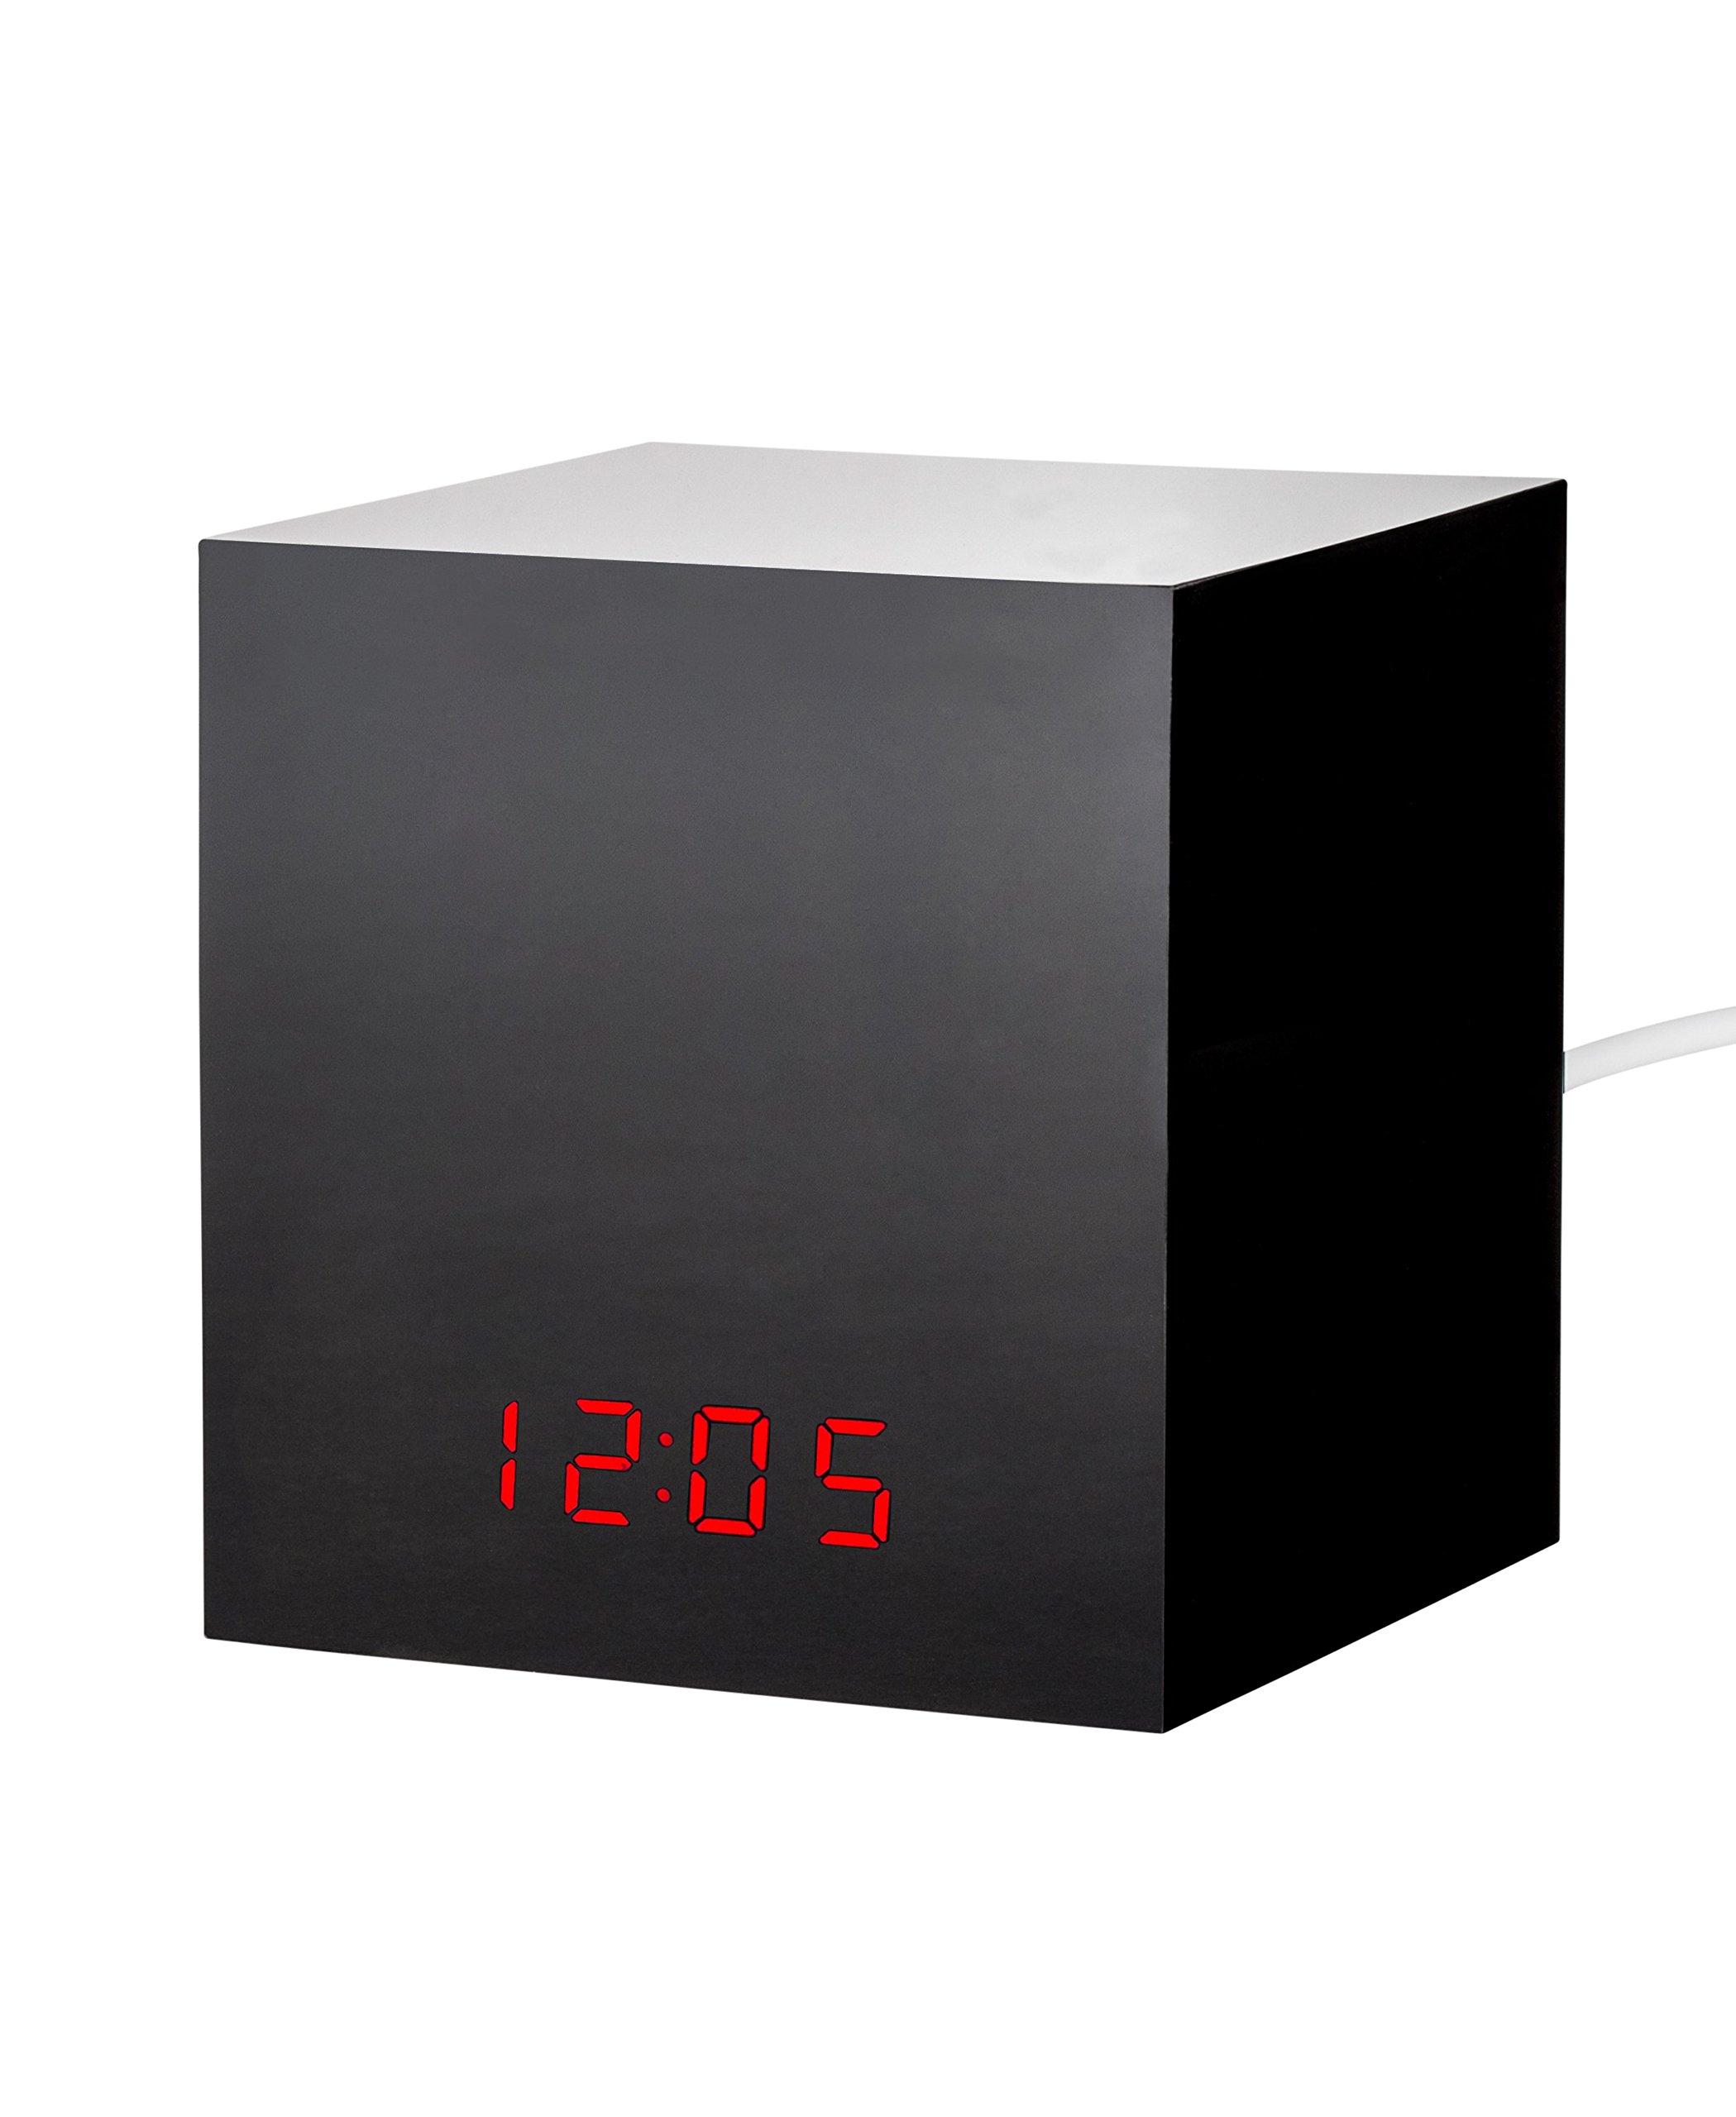 Wasserstein LED Clock Box for Hide Nest Cam/Dropcam Security Camera, Black